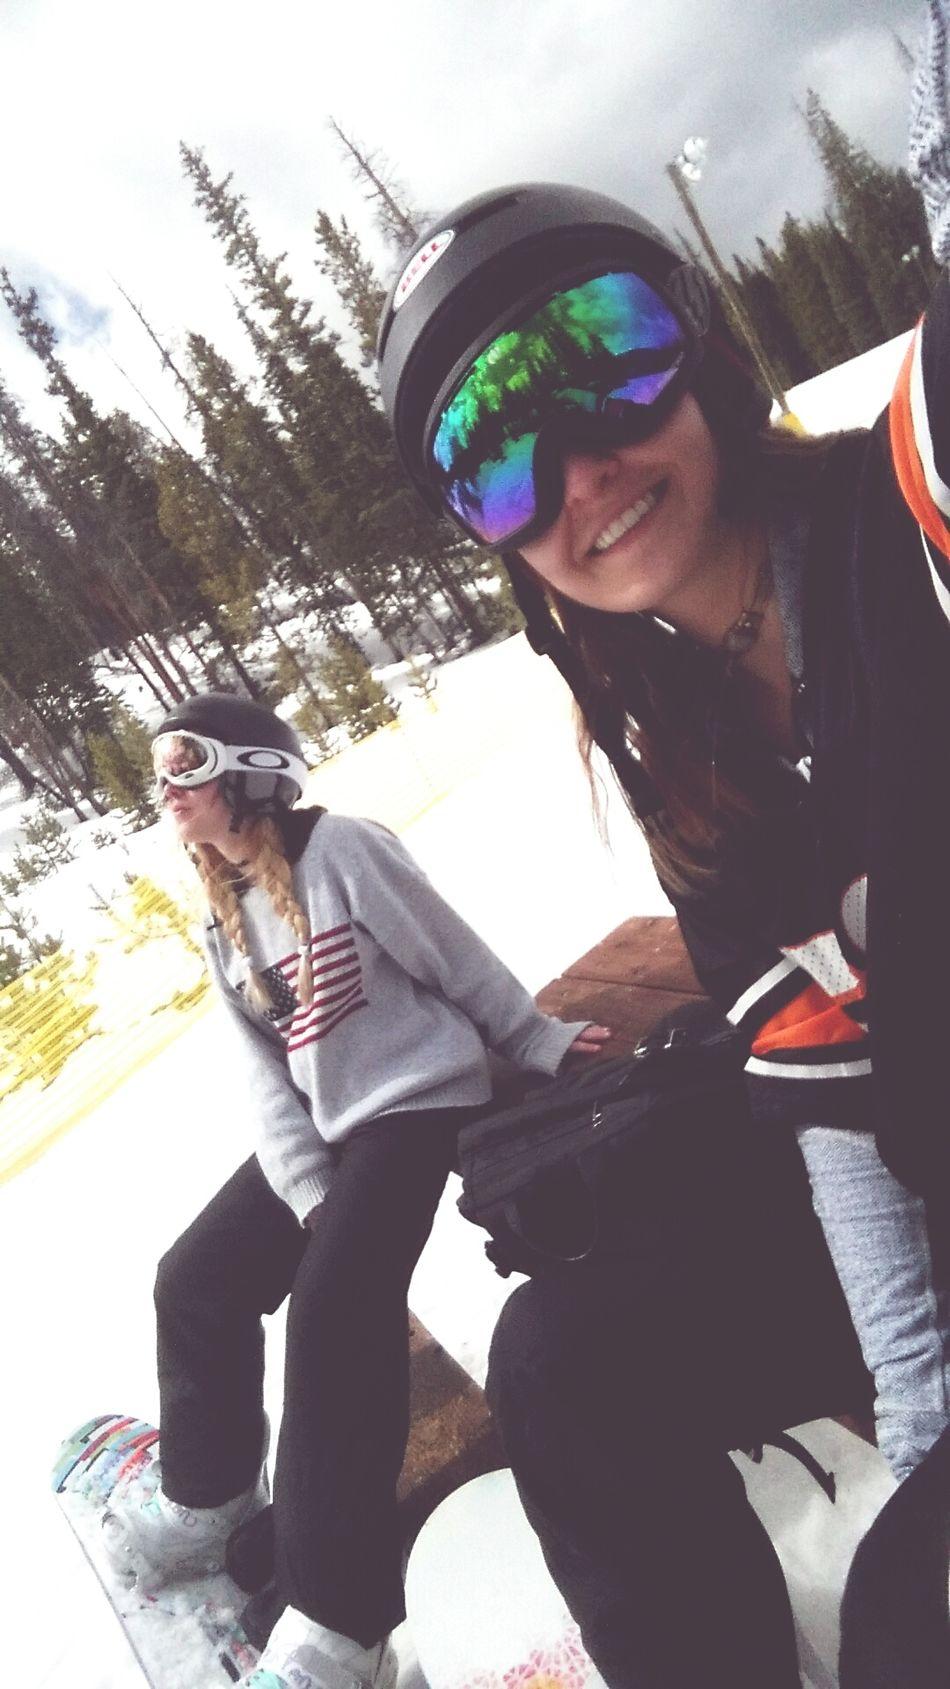 KeystoneSkiResort Rocky Mountains Shredvibes Mountains Exploration Pinetrees Snowboarding Sisters